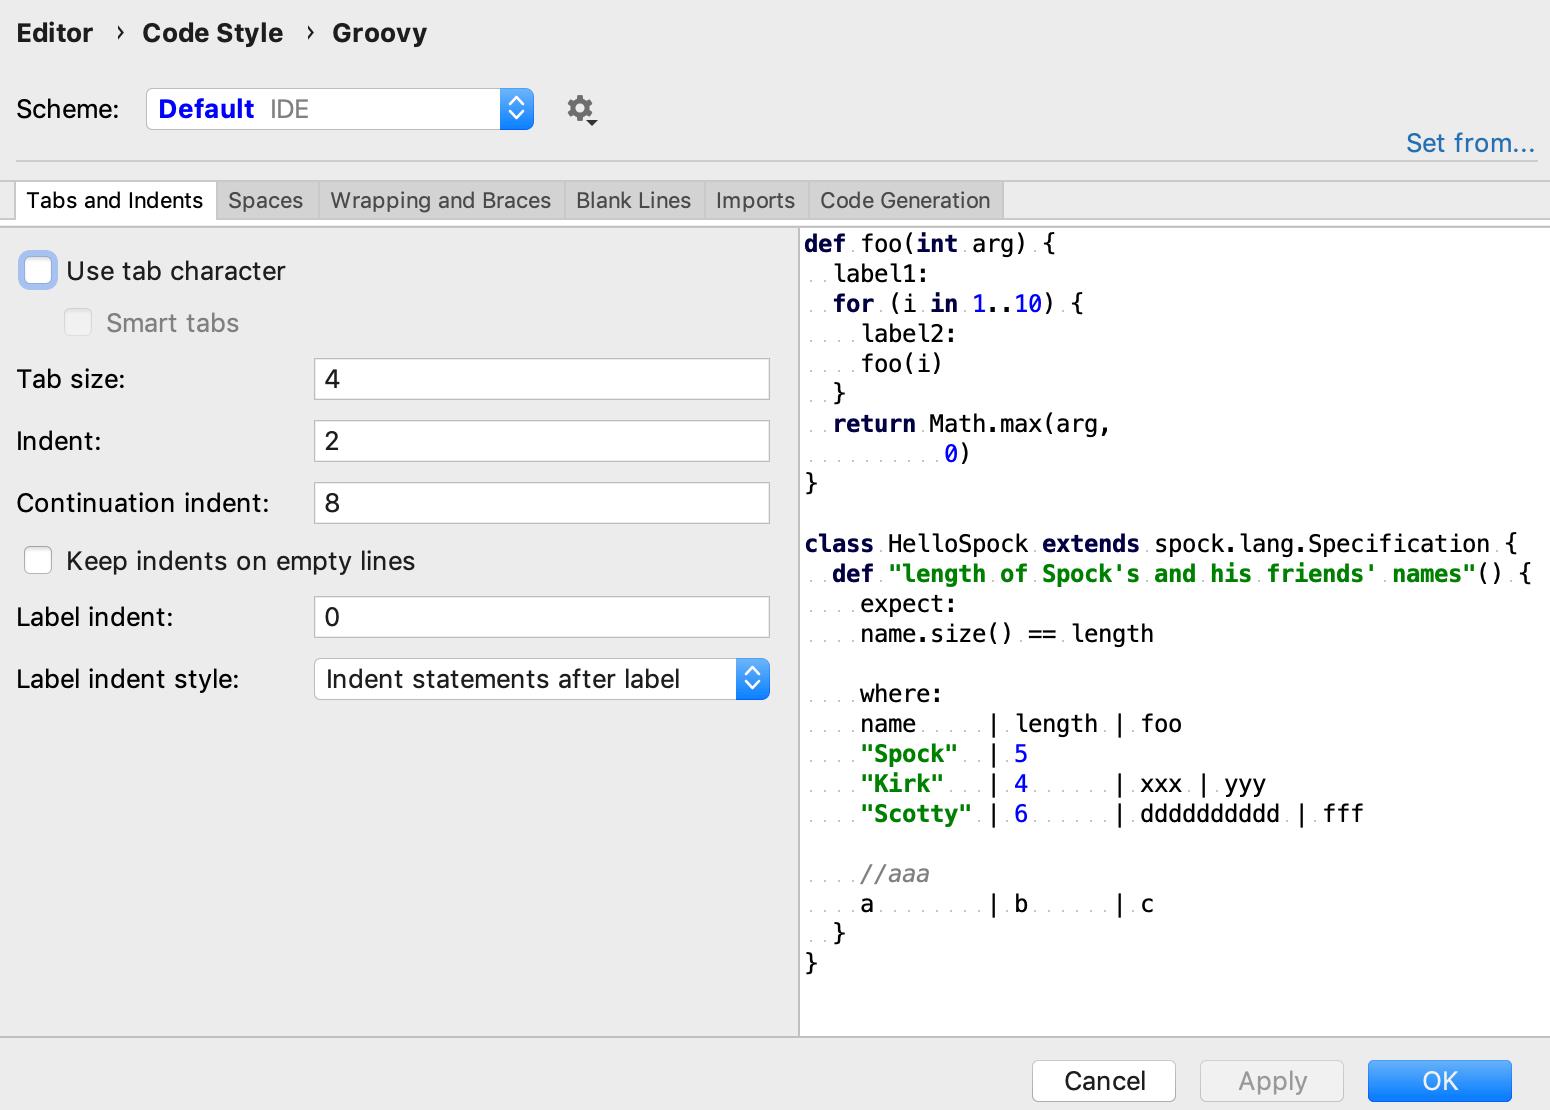 Groovy code style settings